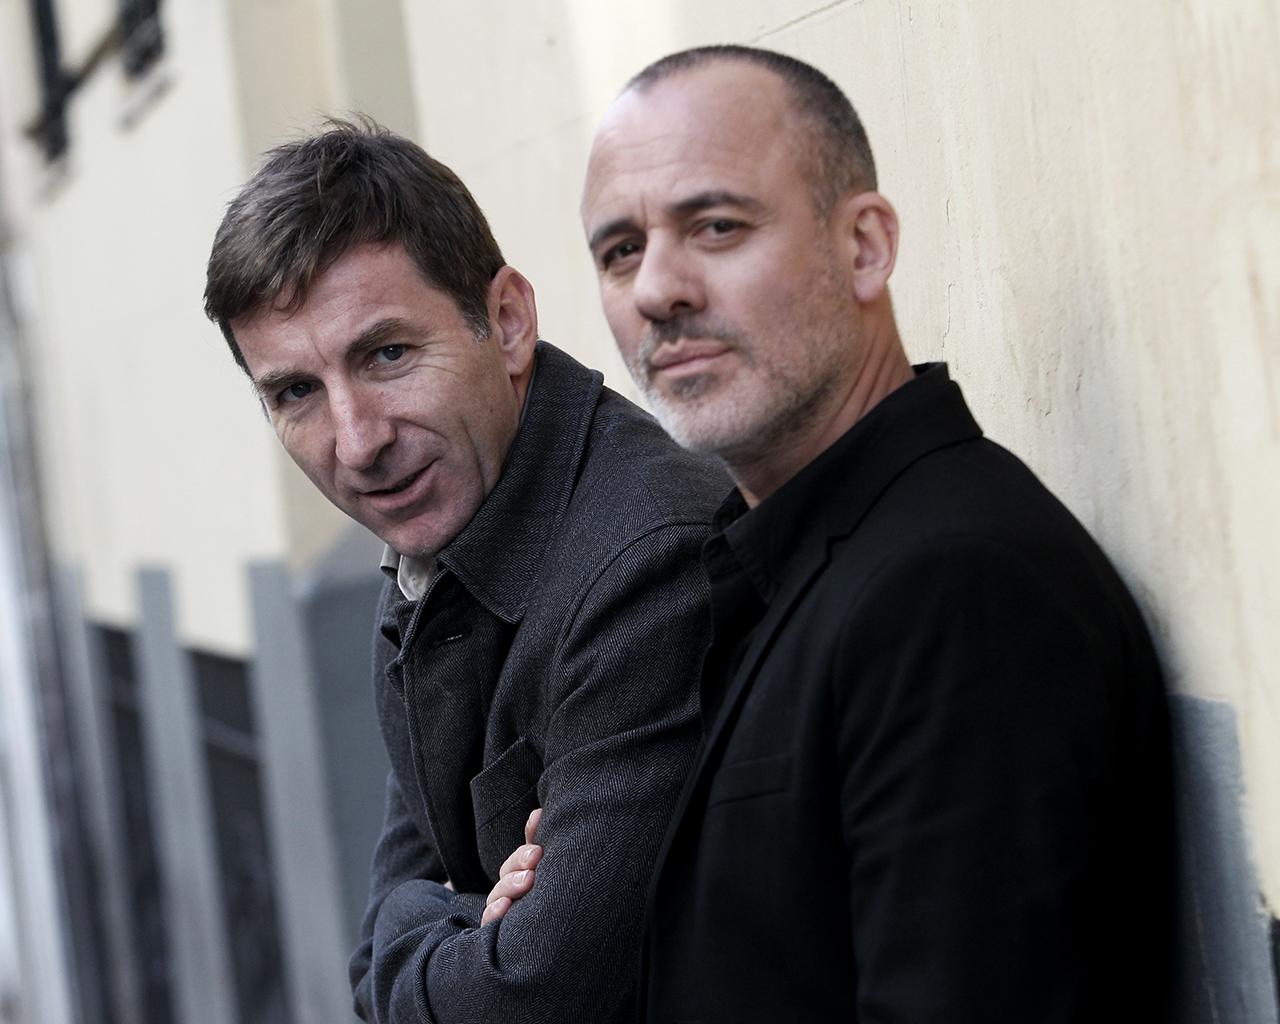 Antonio y Javier